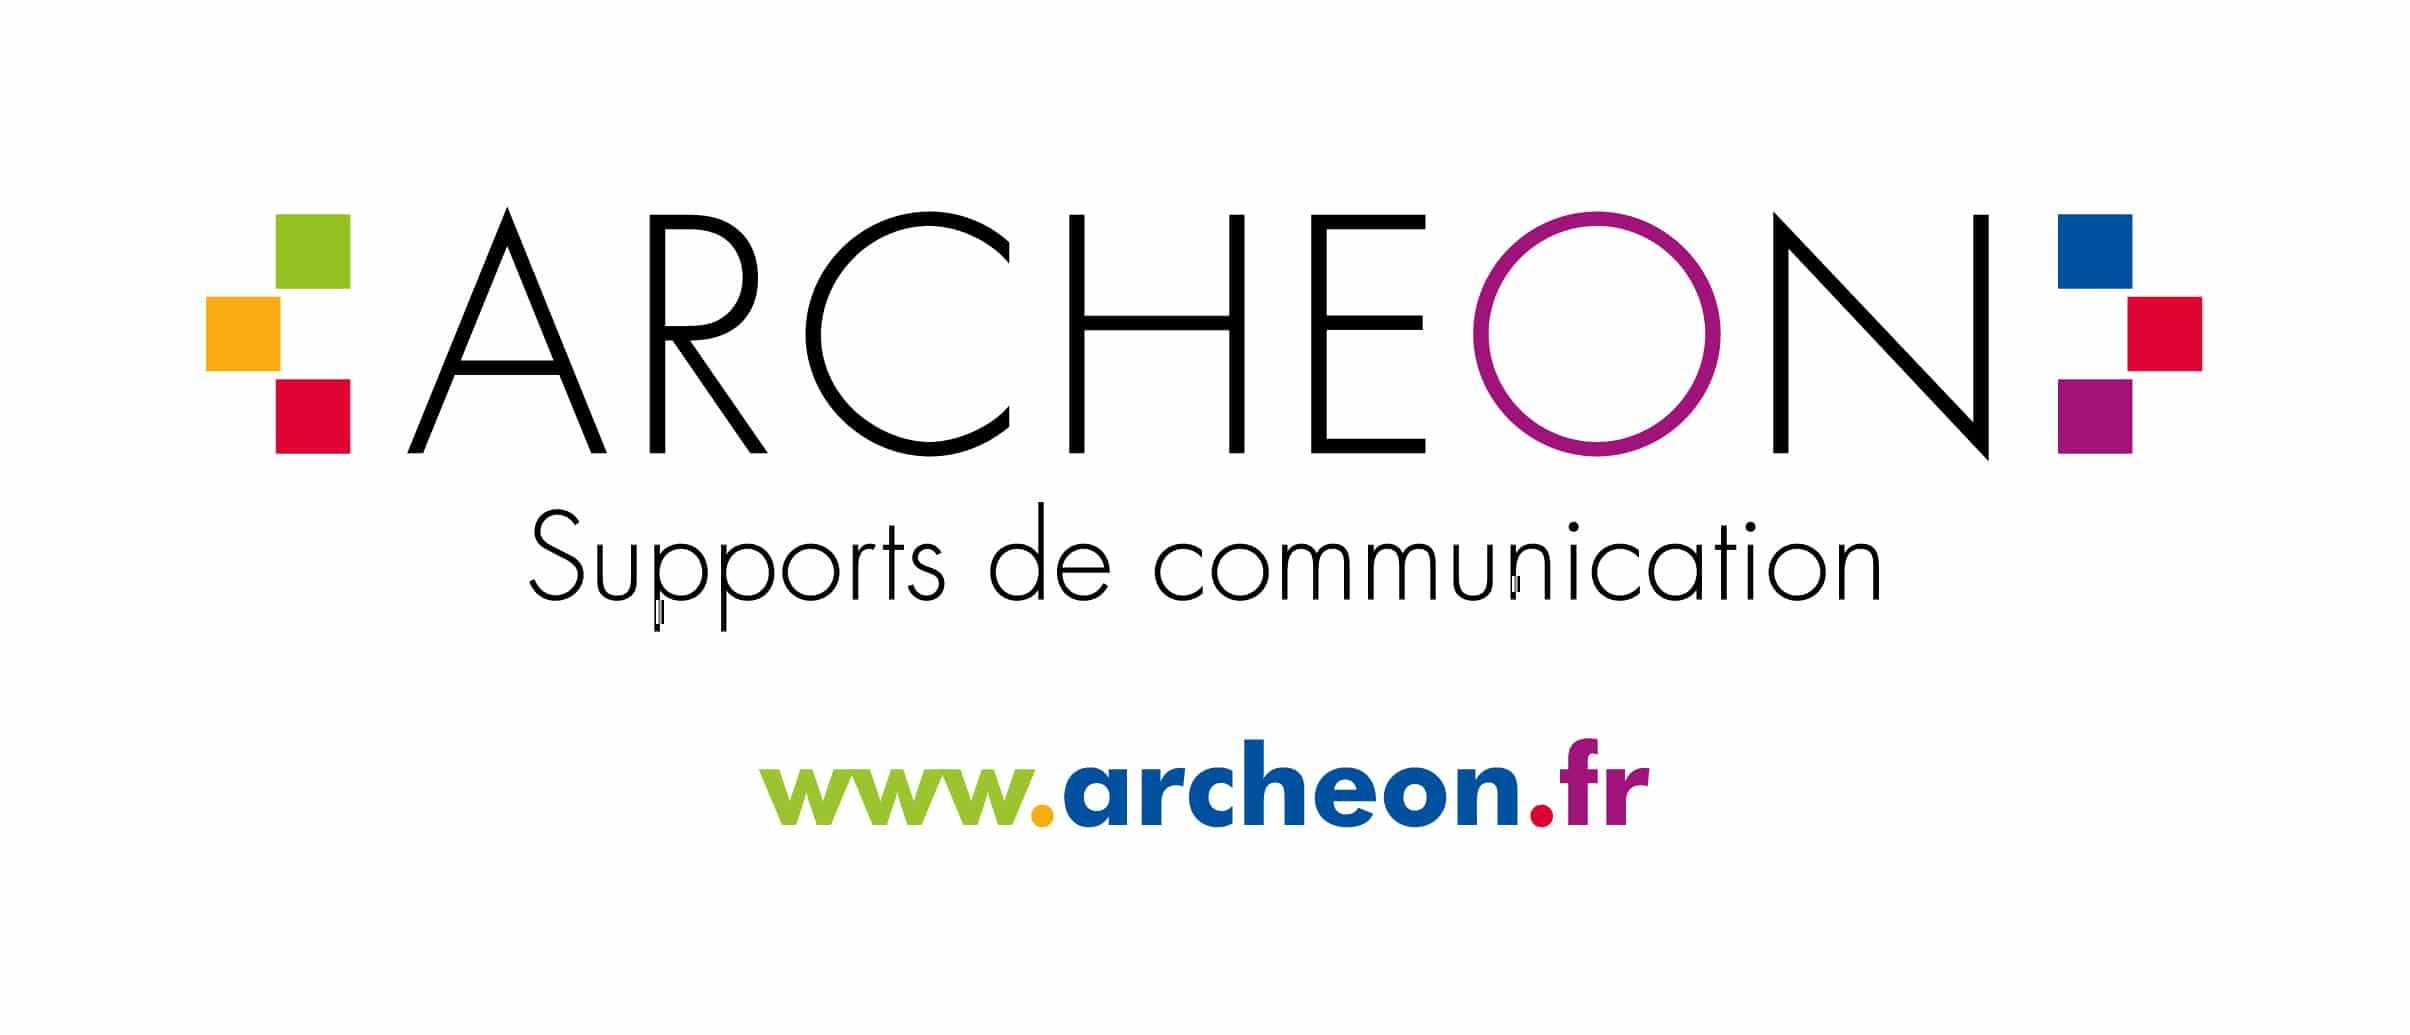 LOGO ARCHEON supports de communication objet media responsable utile original